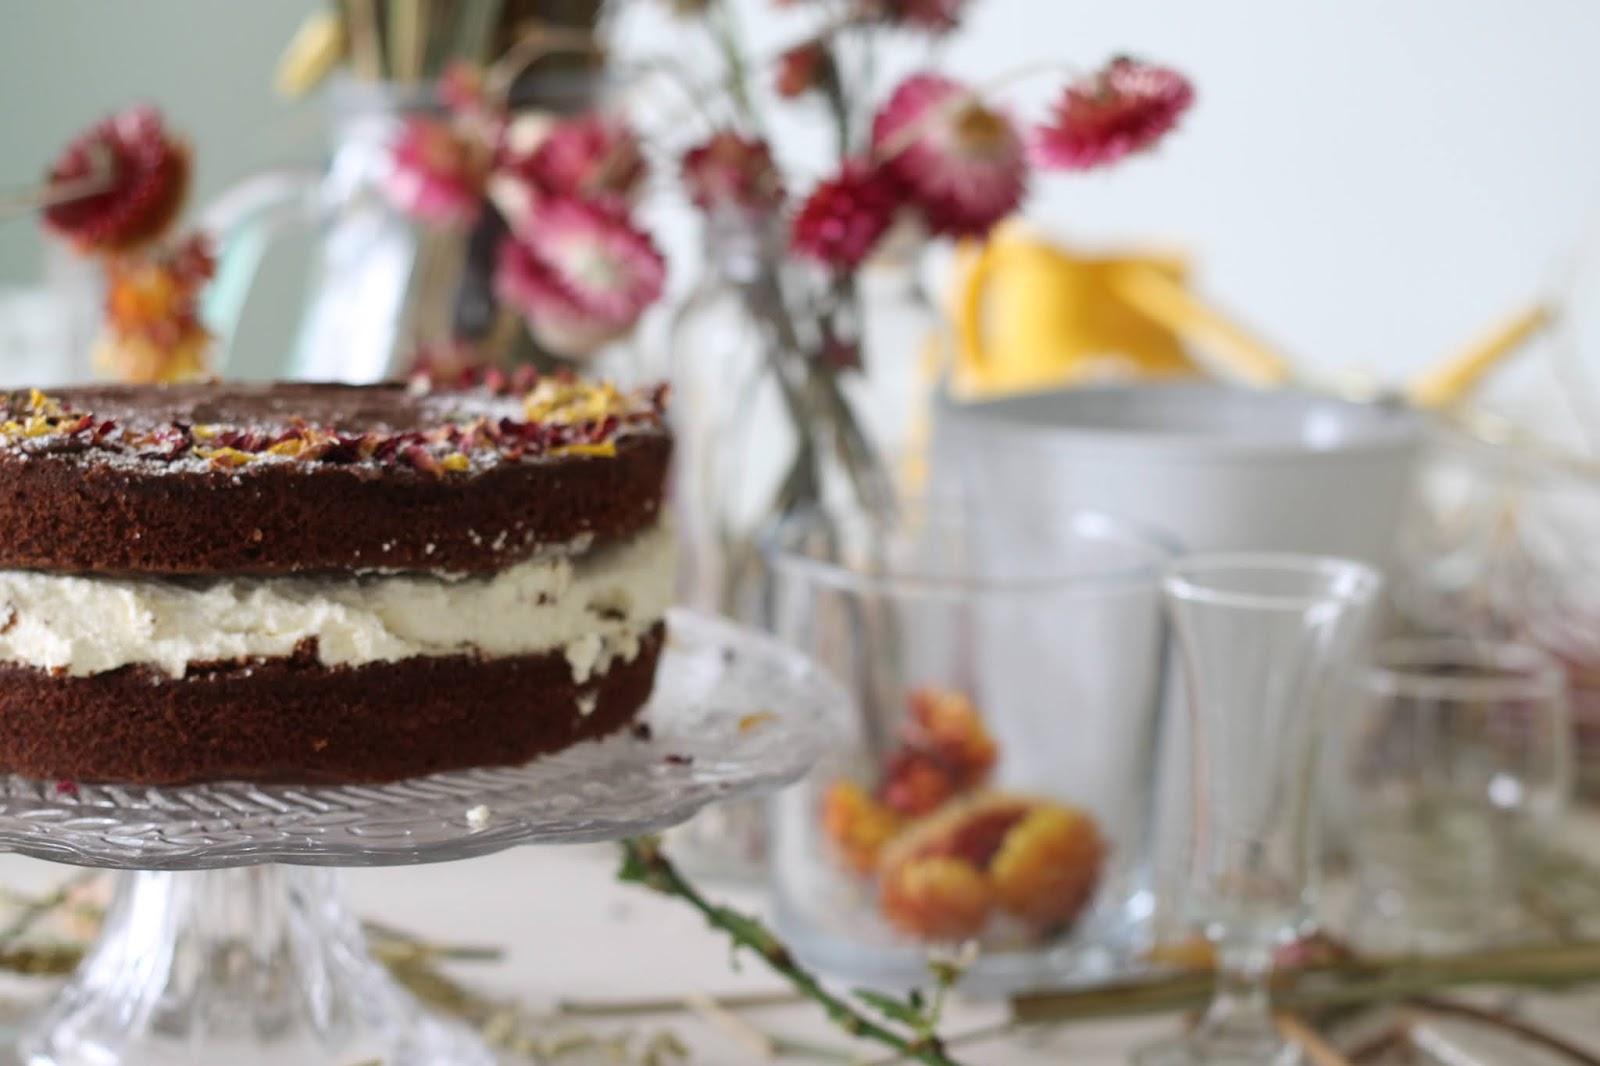 Petal_Cake_1